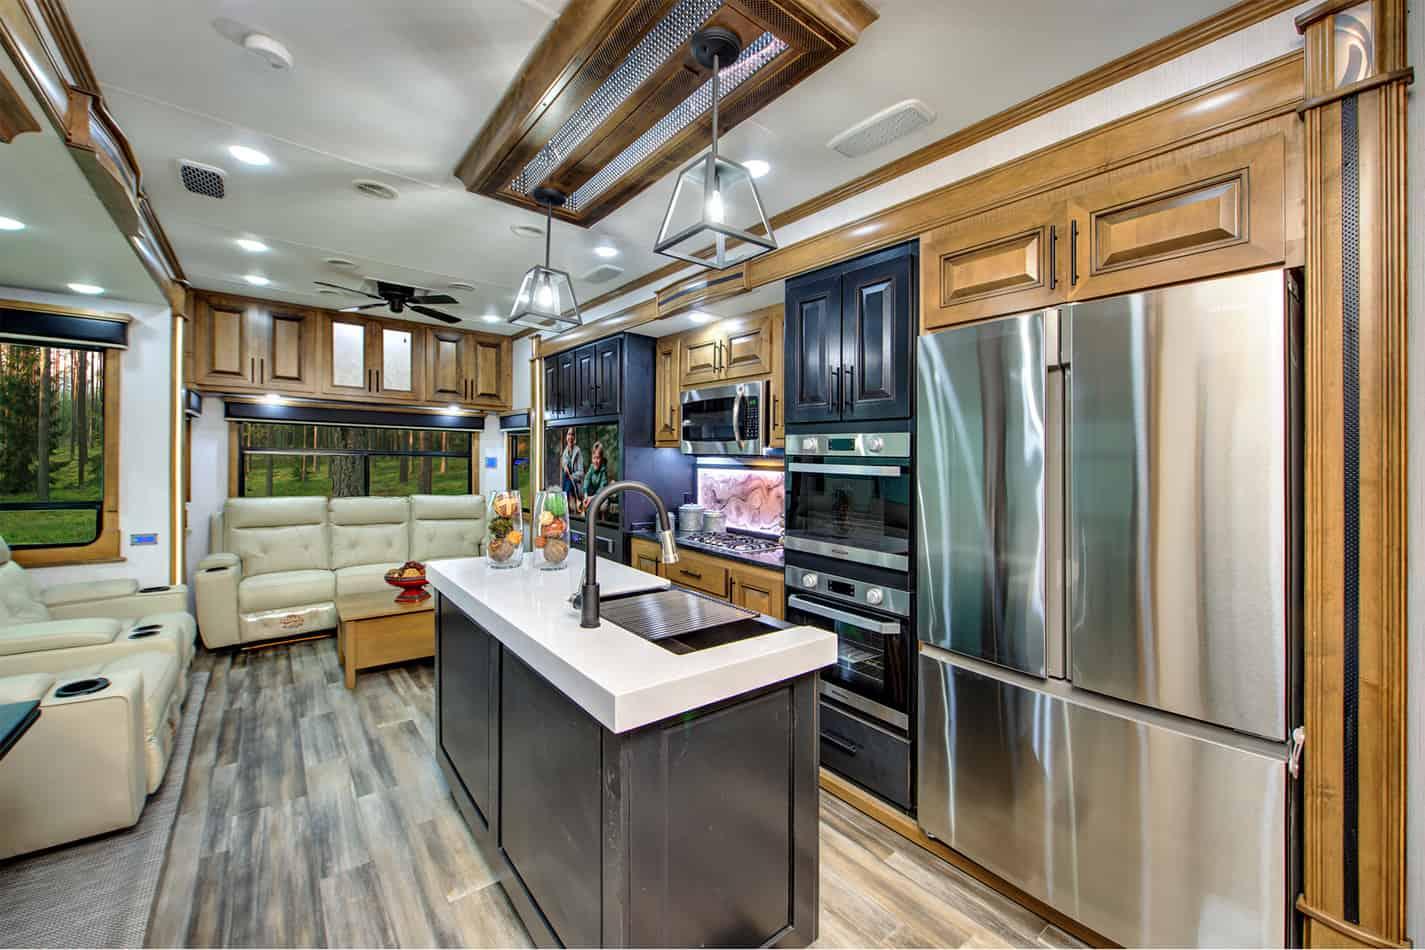 Full-size kitchen in the Landmark Newport.